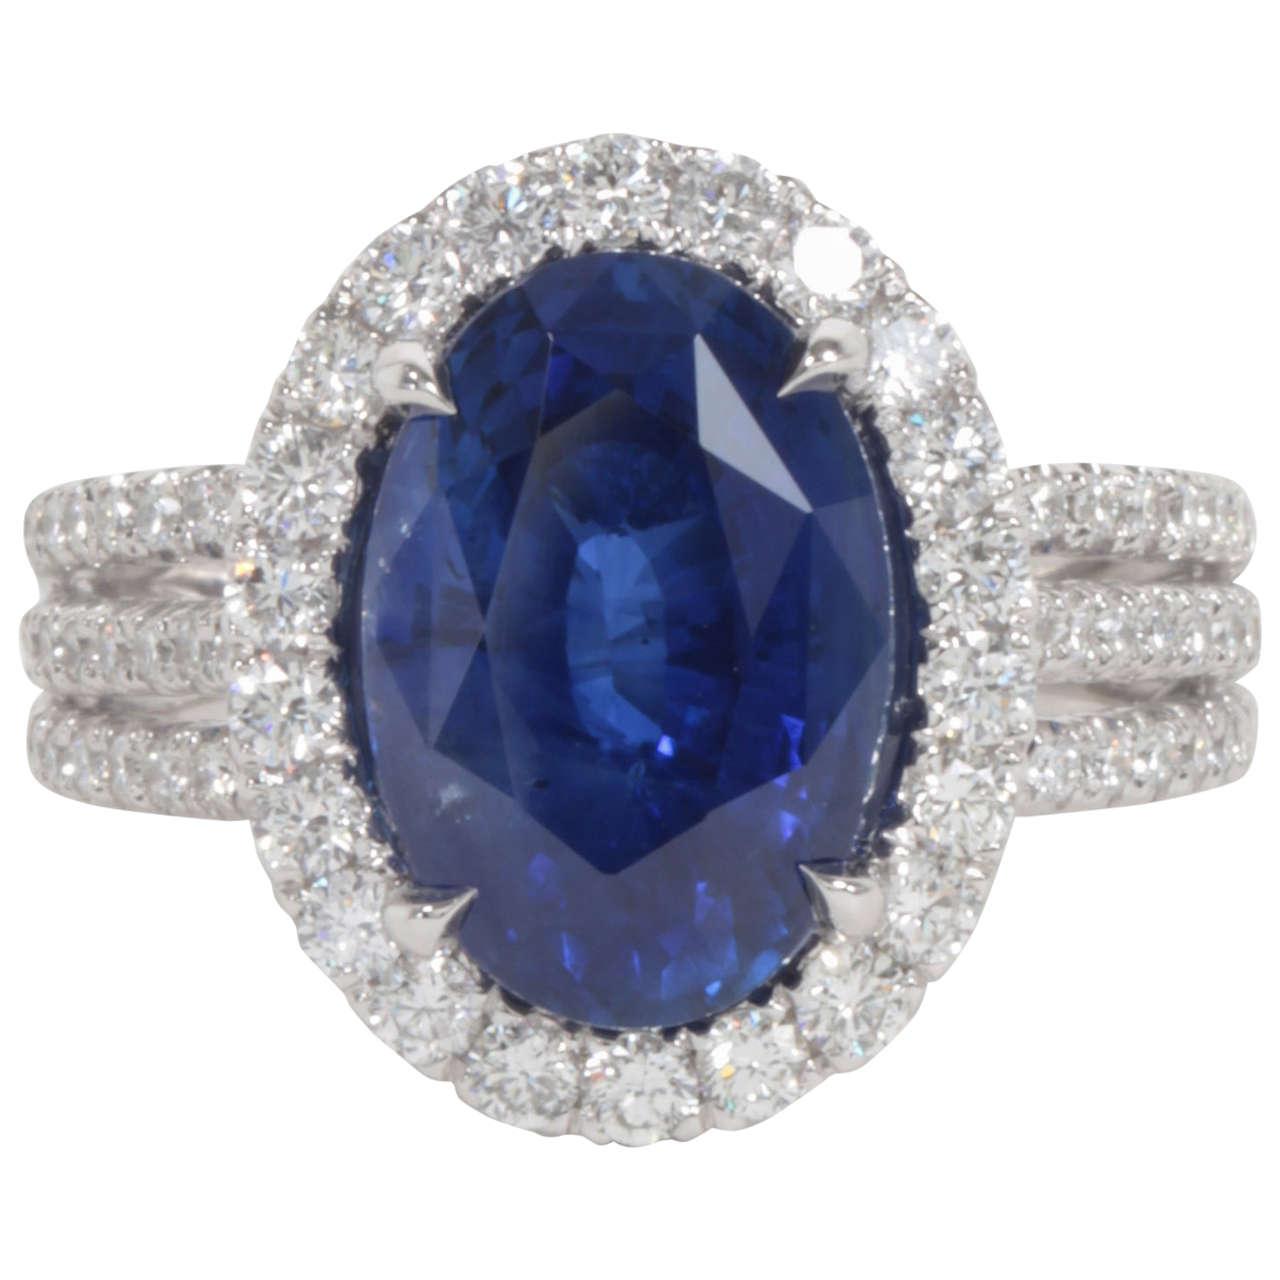 Certified Royal Blue Sapphire Diamond Ring